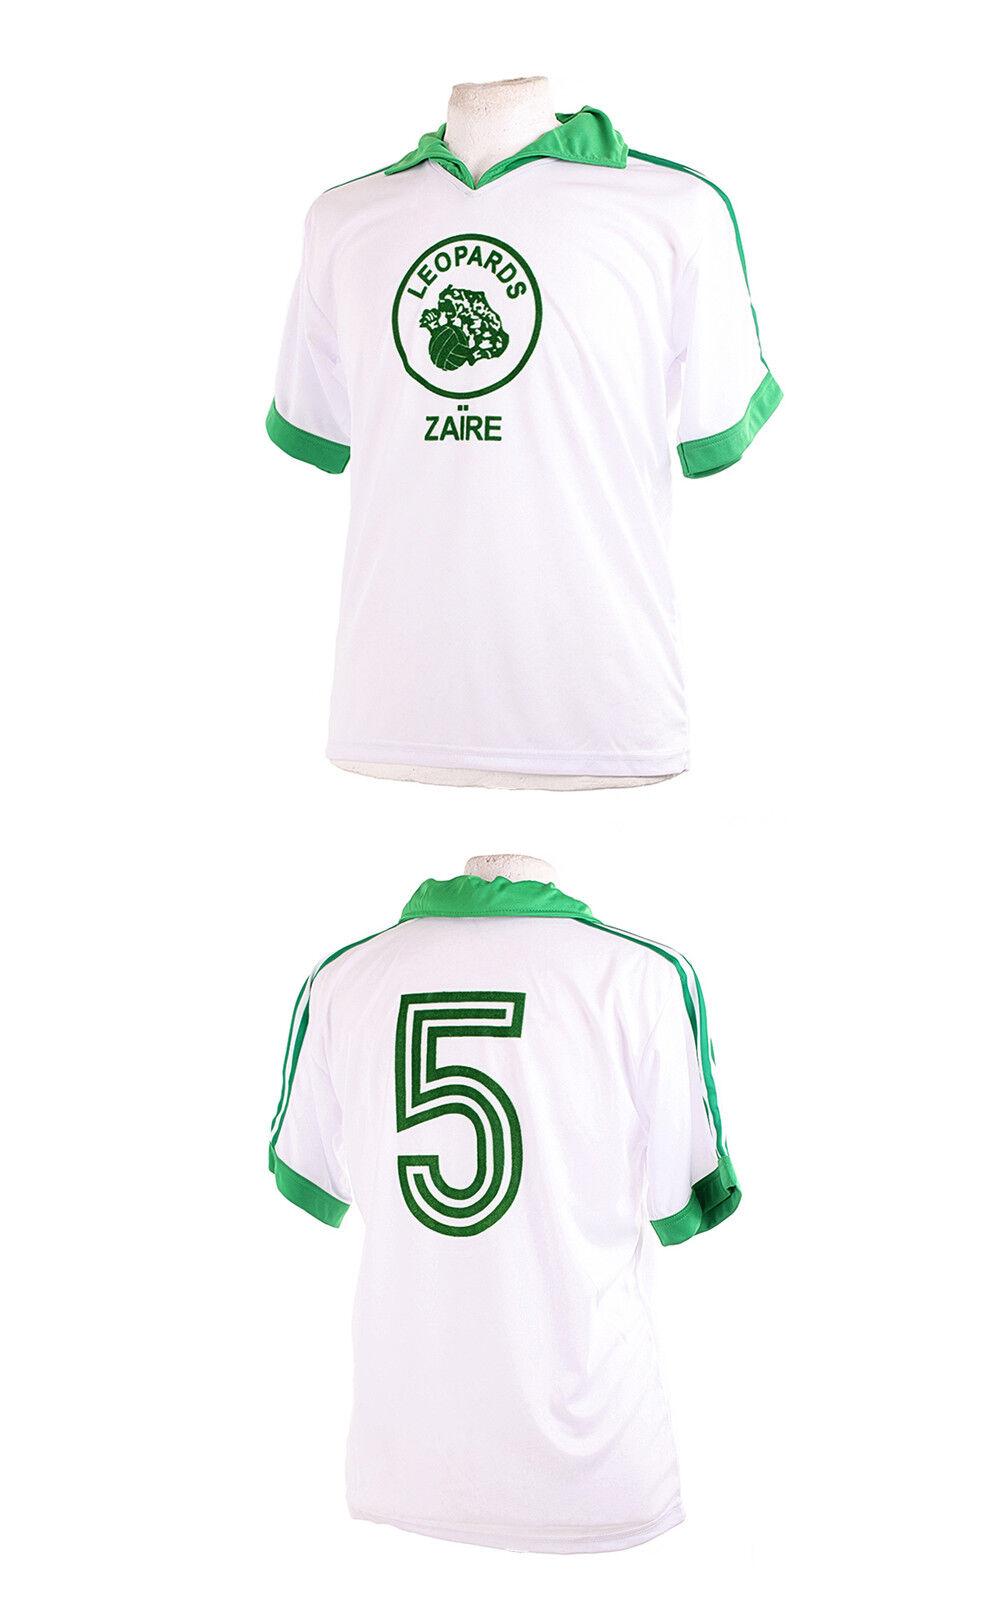 ZAIRE LEOPARDS WHITE 1974 WORLD CUP NUMBER 5 FOOTBALL SHIRT XXL